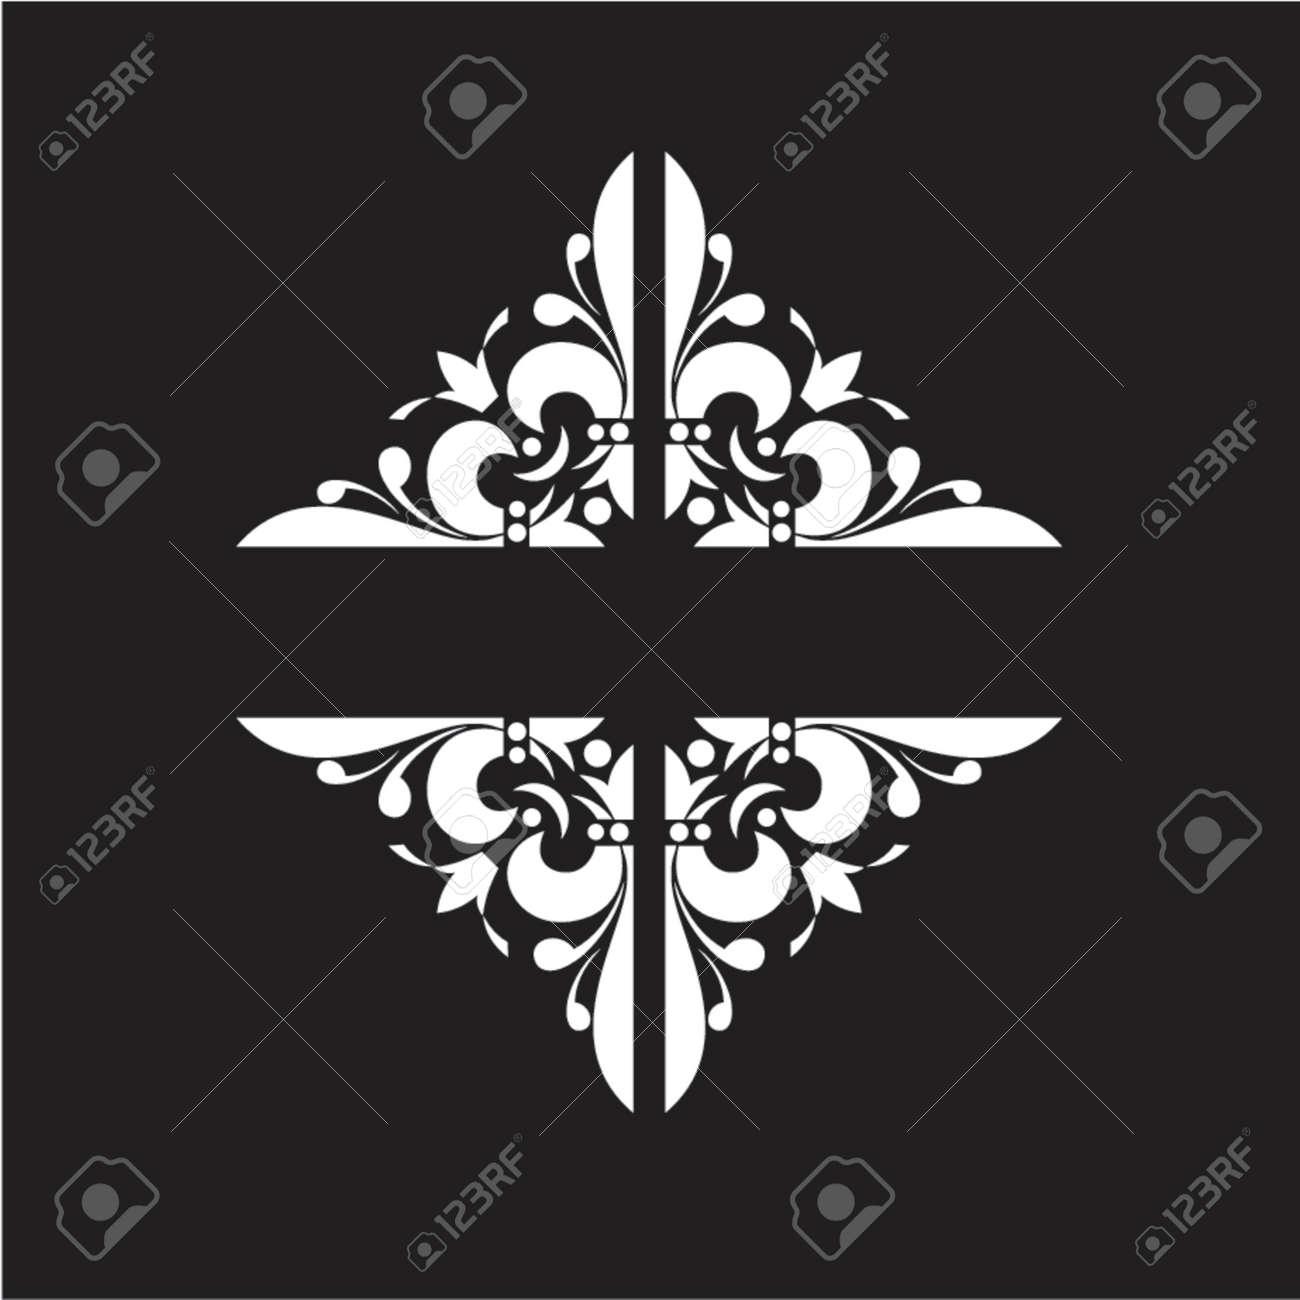 Decorative Vintage Ornate Banner. Stock Vector - 1279843